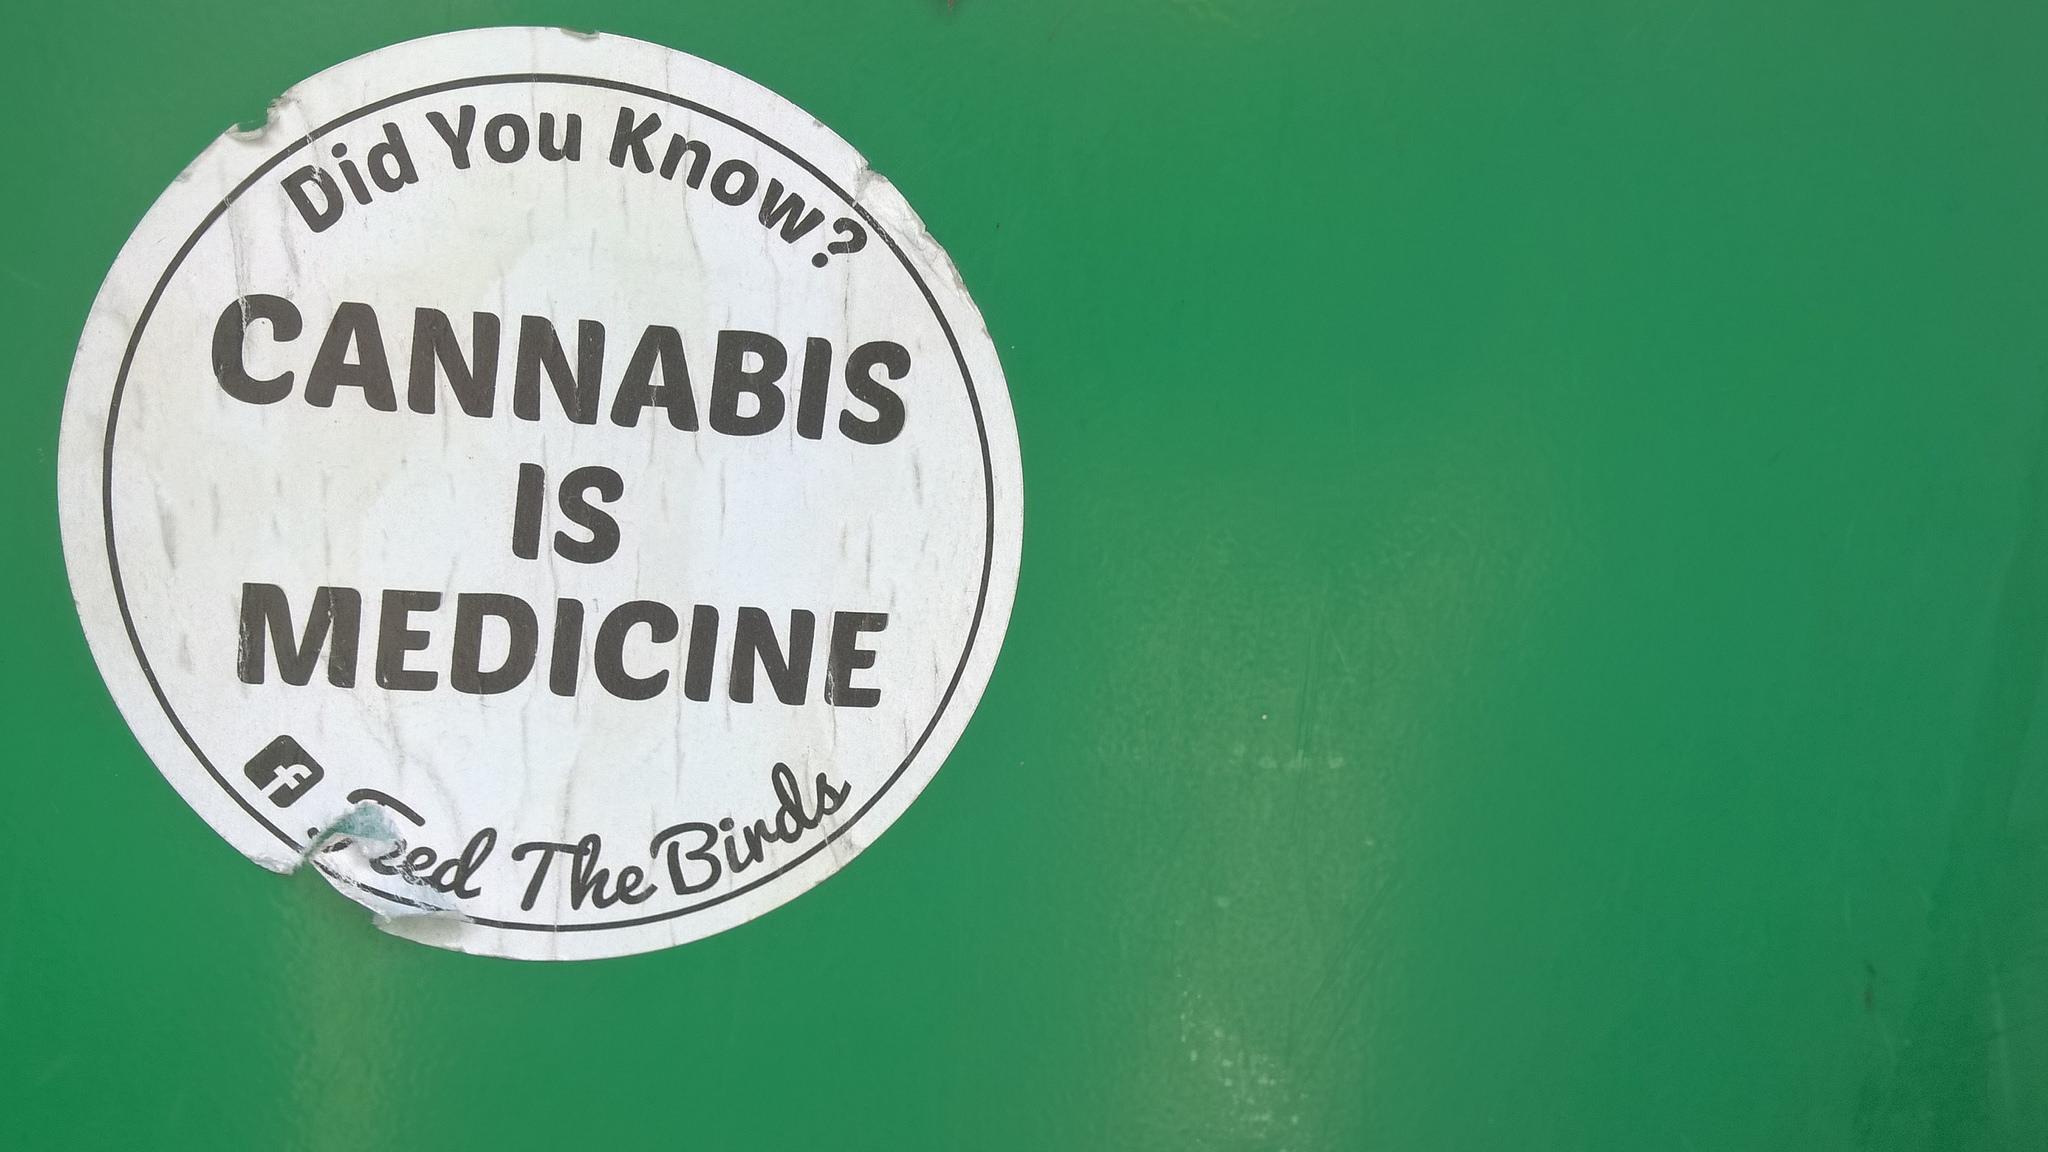 cannabis, weed, errors seeds, pot, oil, hemp,